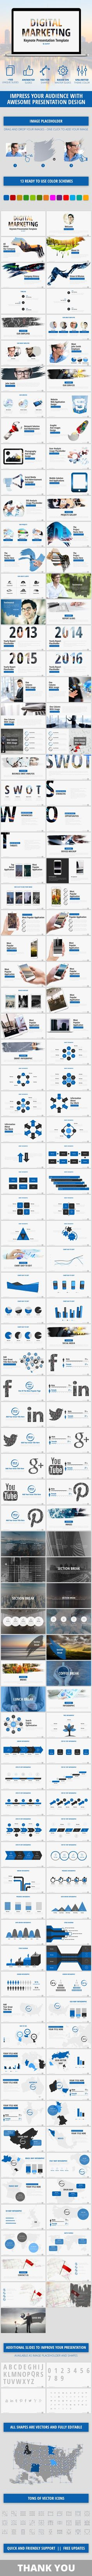 Digital Marketing - Business Keynote Presentation Template. Download here: http://graphicriver.net/item/digital-marketing-business-keynote-presentation/15930766?ref=ksioks